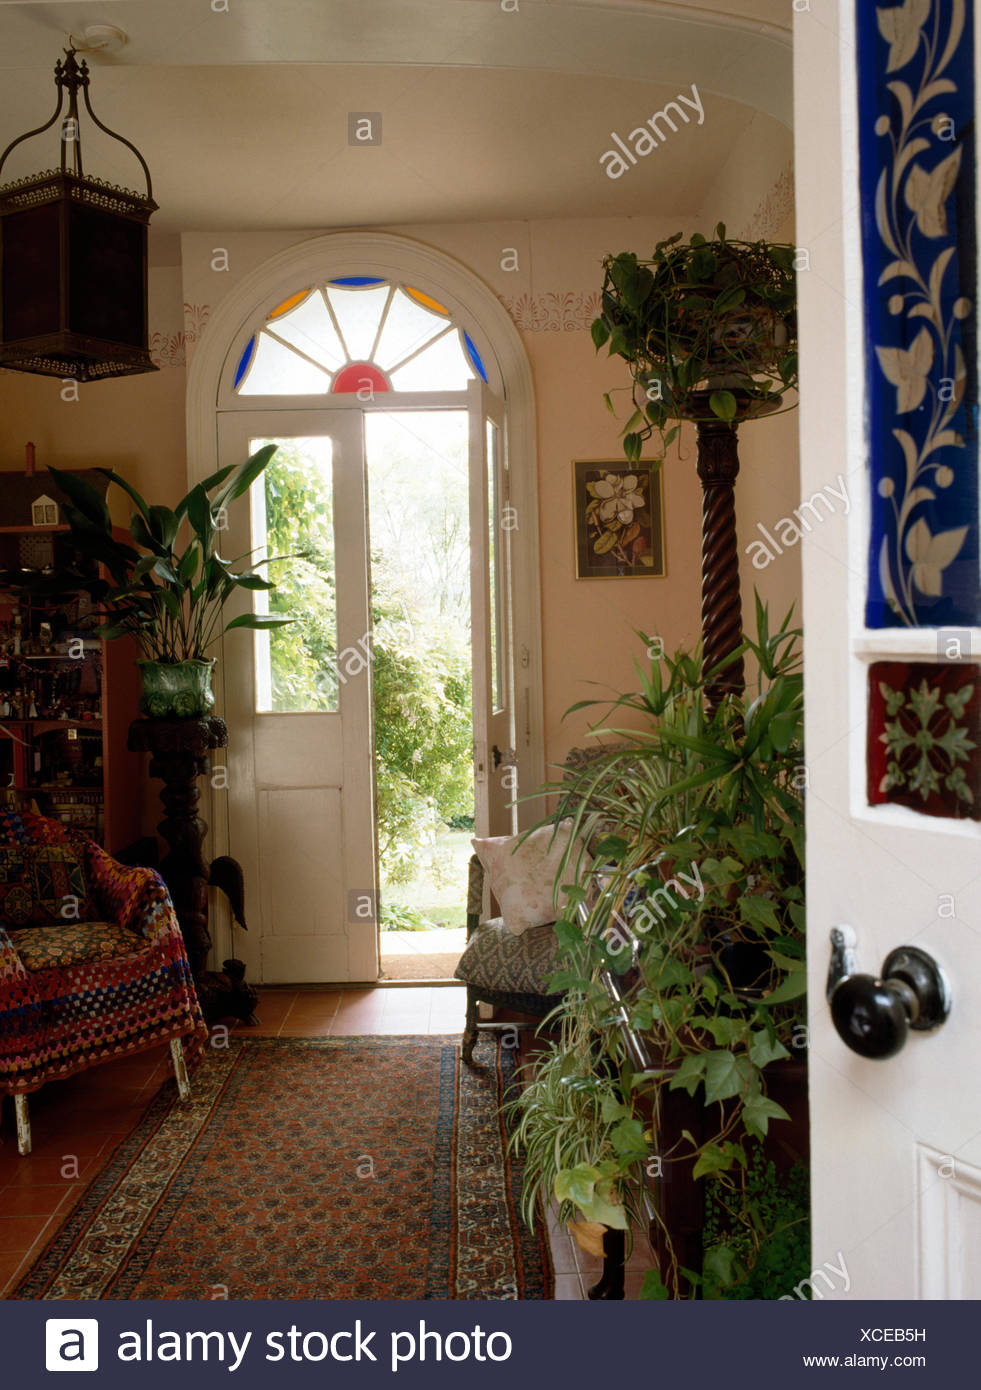 house front door open. Lush Green Houseplants In Early Nineties Victorian Hall With Open Front Door - Stock Image House